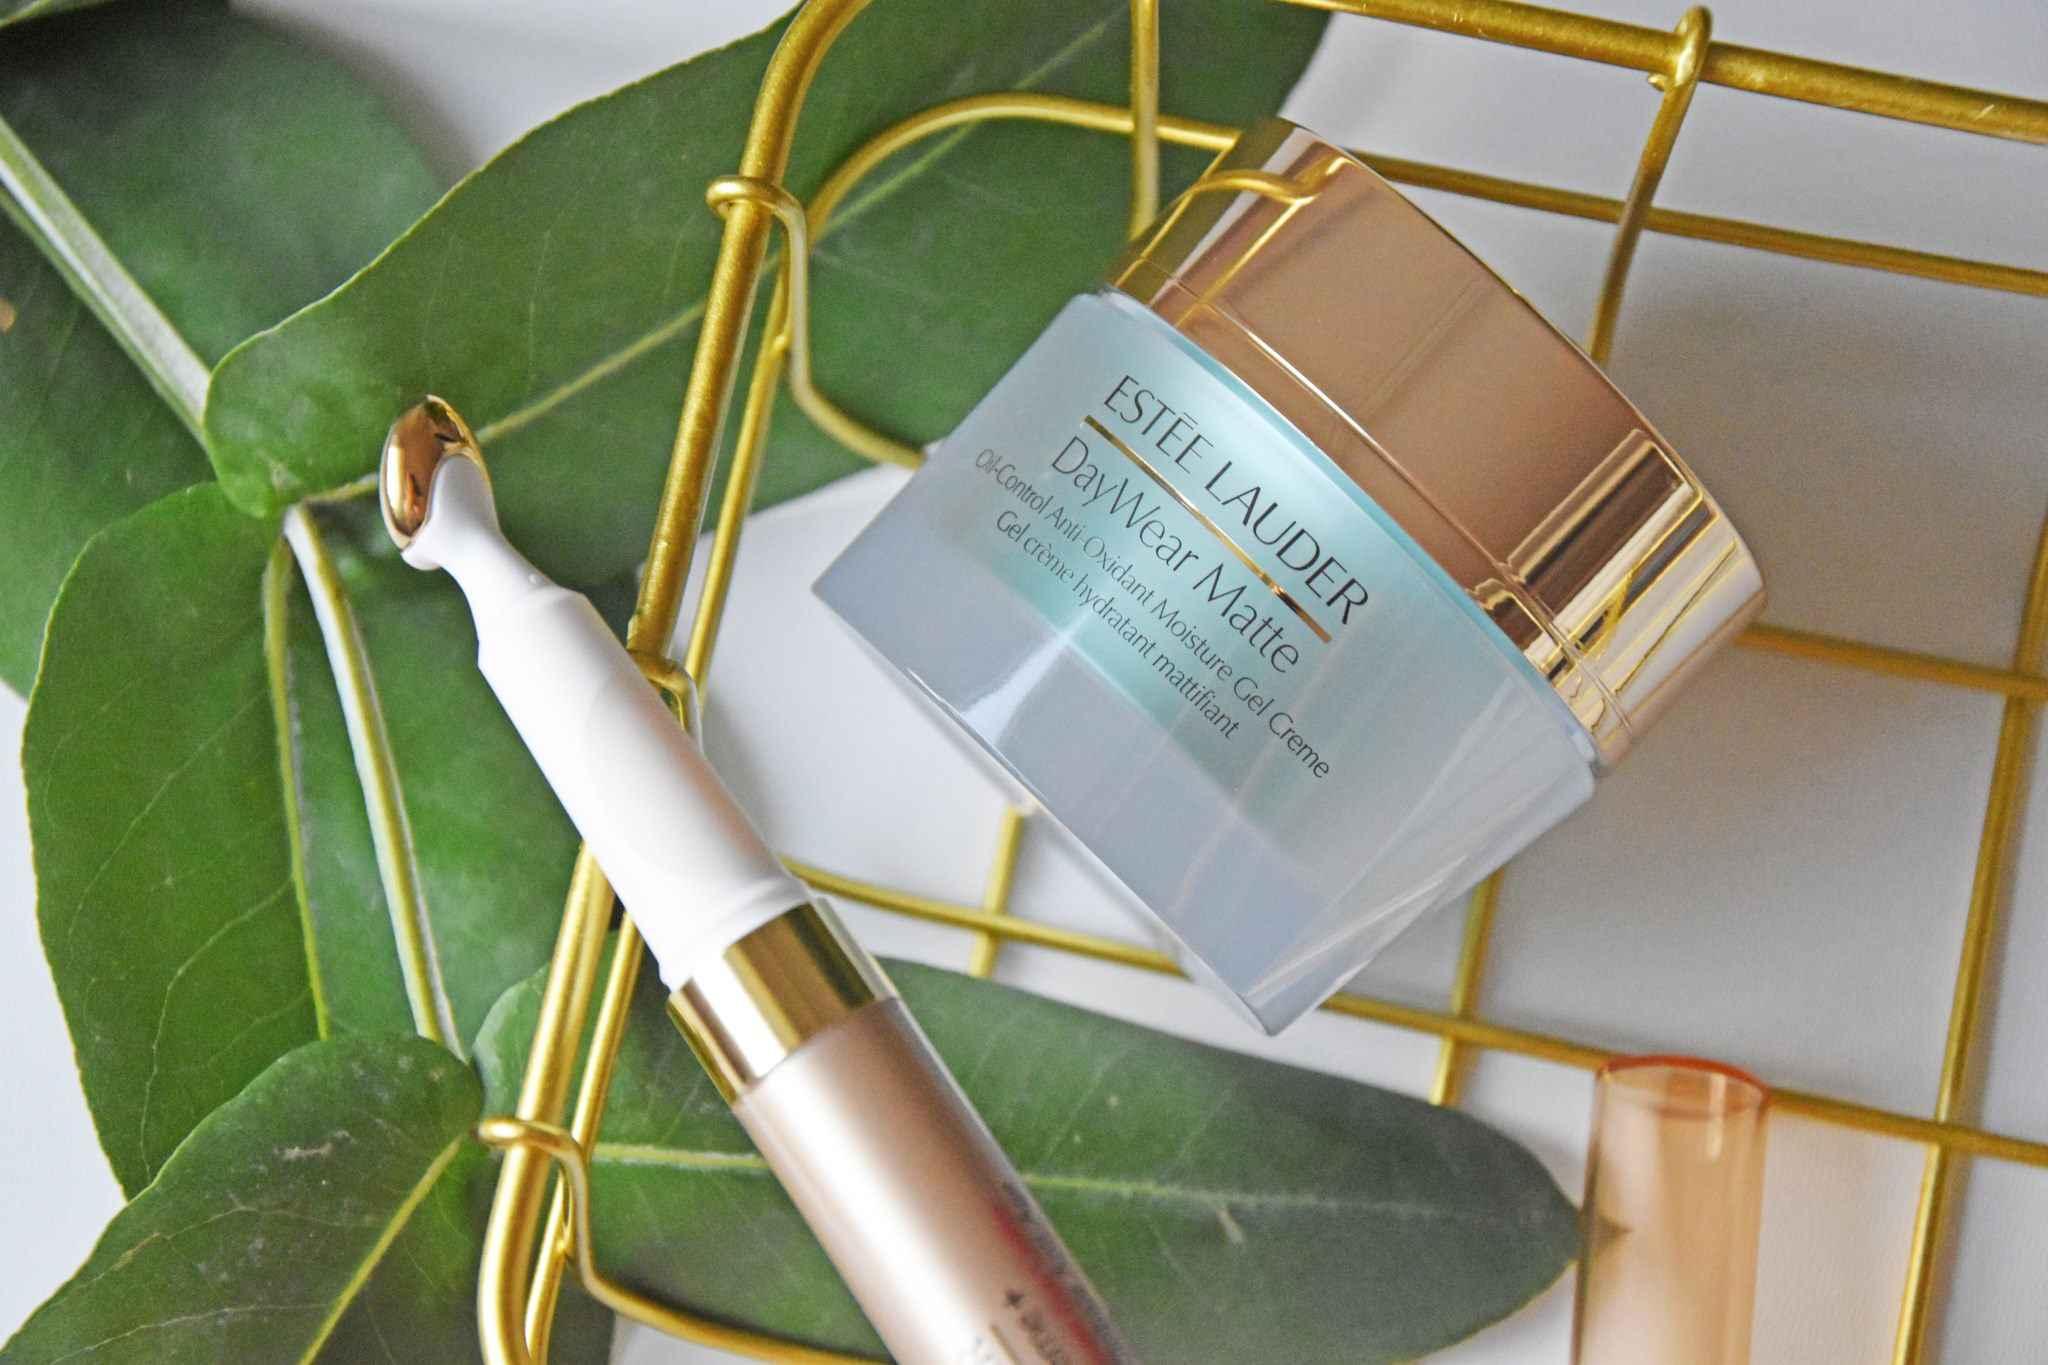 Estée Lauder - Day Wear Matte & Global Anti-Aging Cell Power Eye Gelée